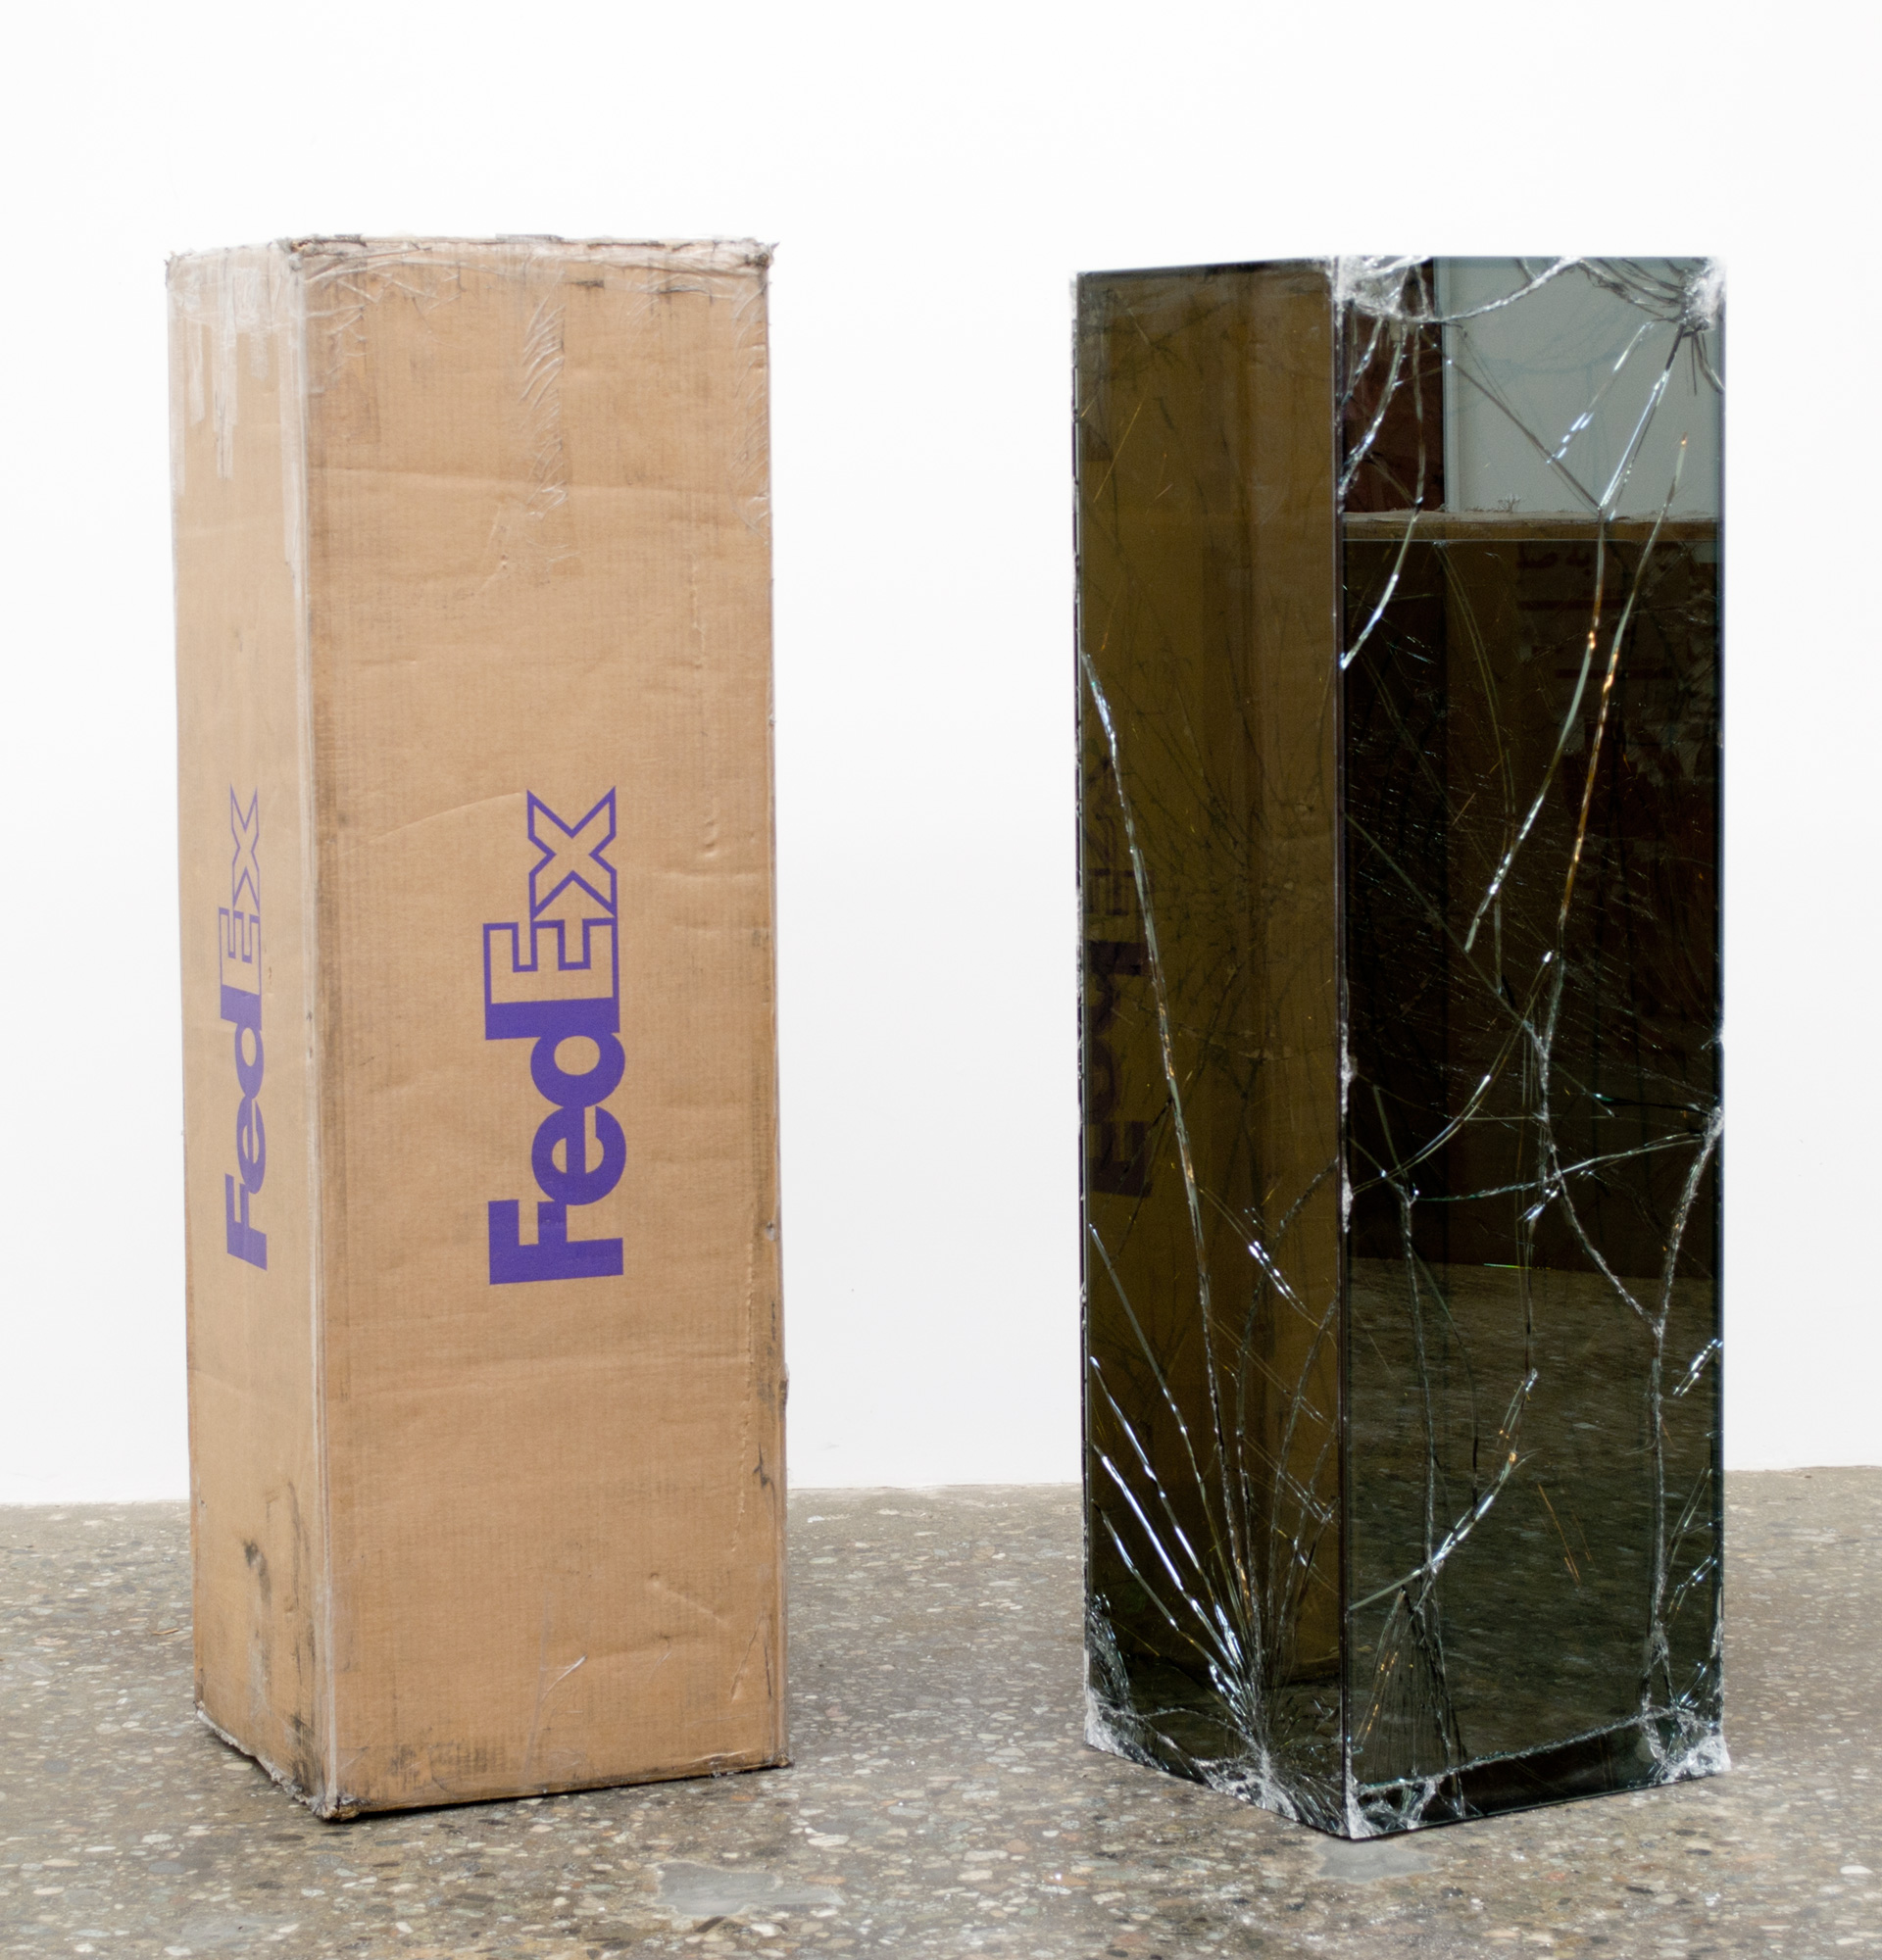 FedEx® Golf-Bag Box  © 2010 FedEx 163166 REV 10/10 Standard Overnight, Los Angeles–New York trk#793767865564, July 10–11, 2012, Standard Overnight, New York–Los Angeles trk#793767890360, July 11–12, 2012    2012–   Laminated glass, FedEx shipping box, accrued FedEx shipping and tracking labels, silicone, metal, tape  48 x 15 x 15 inches